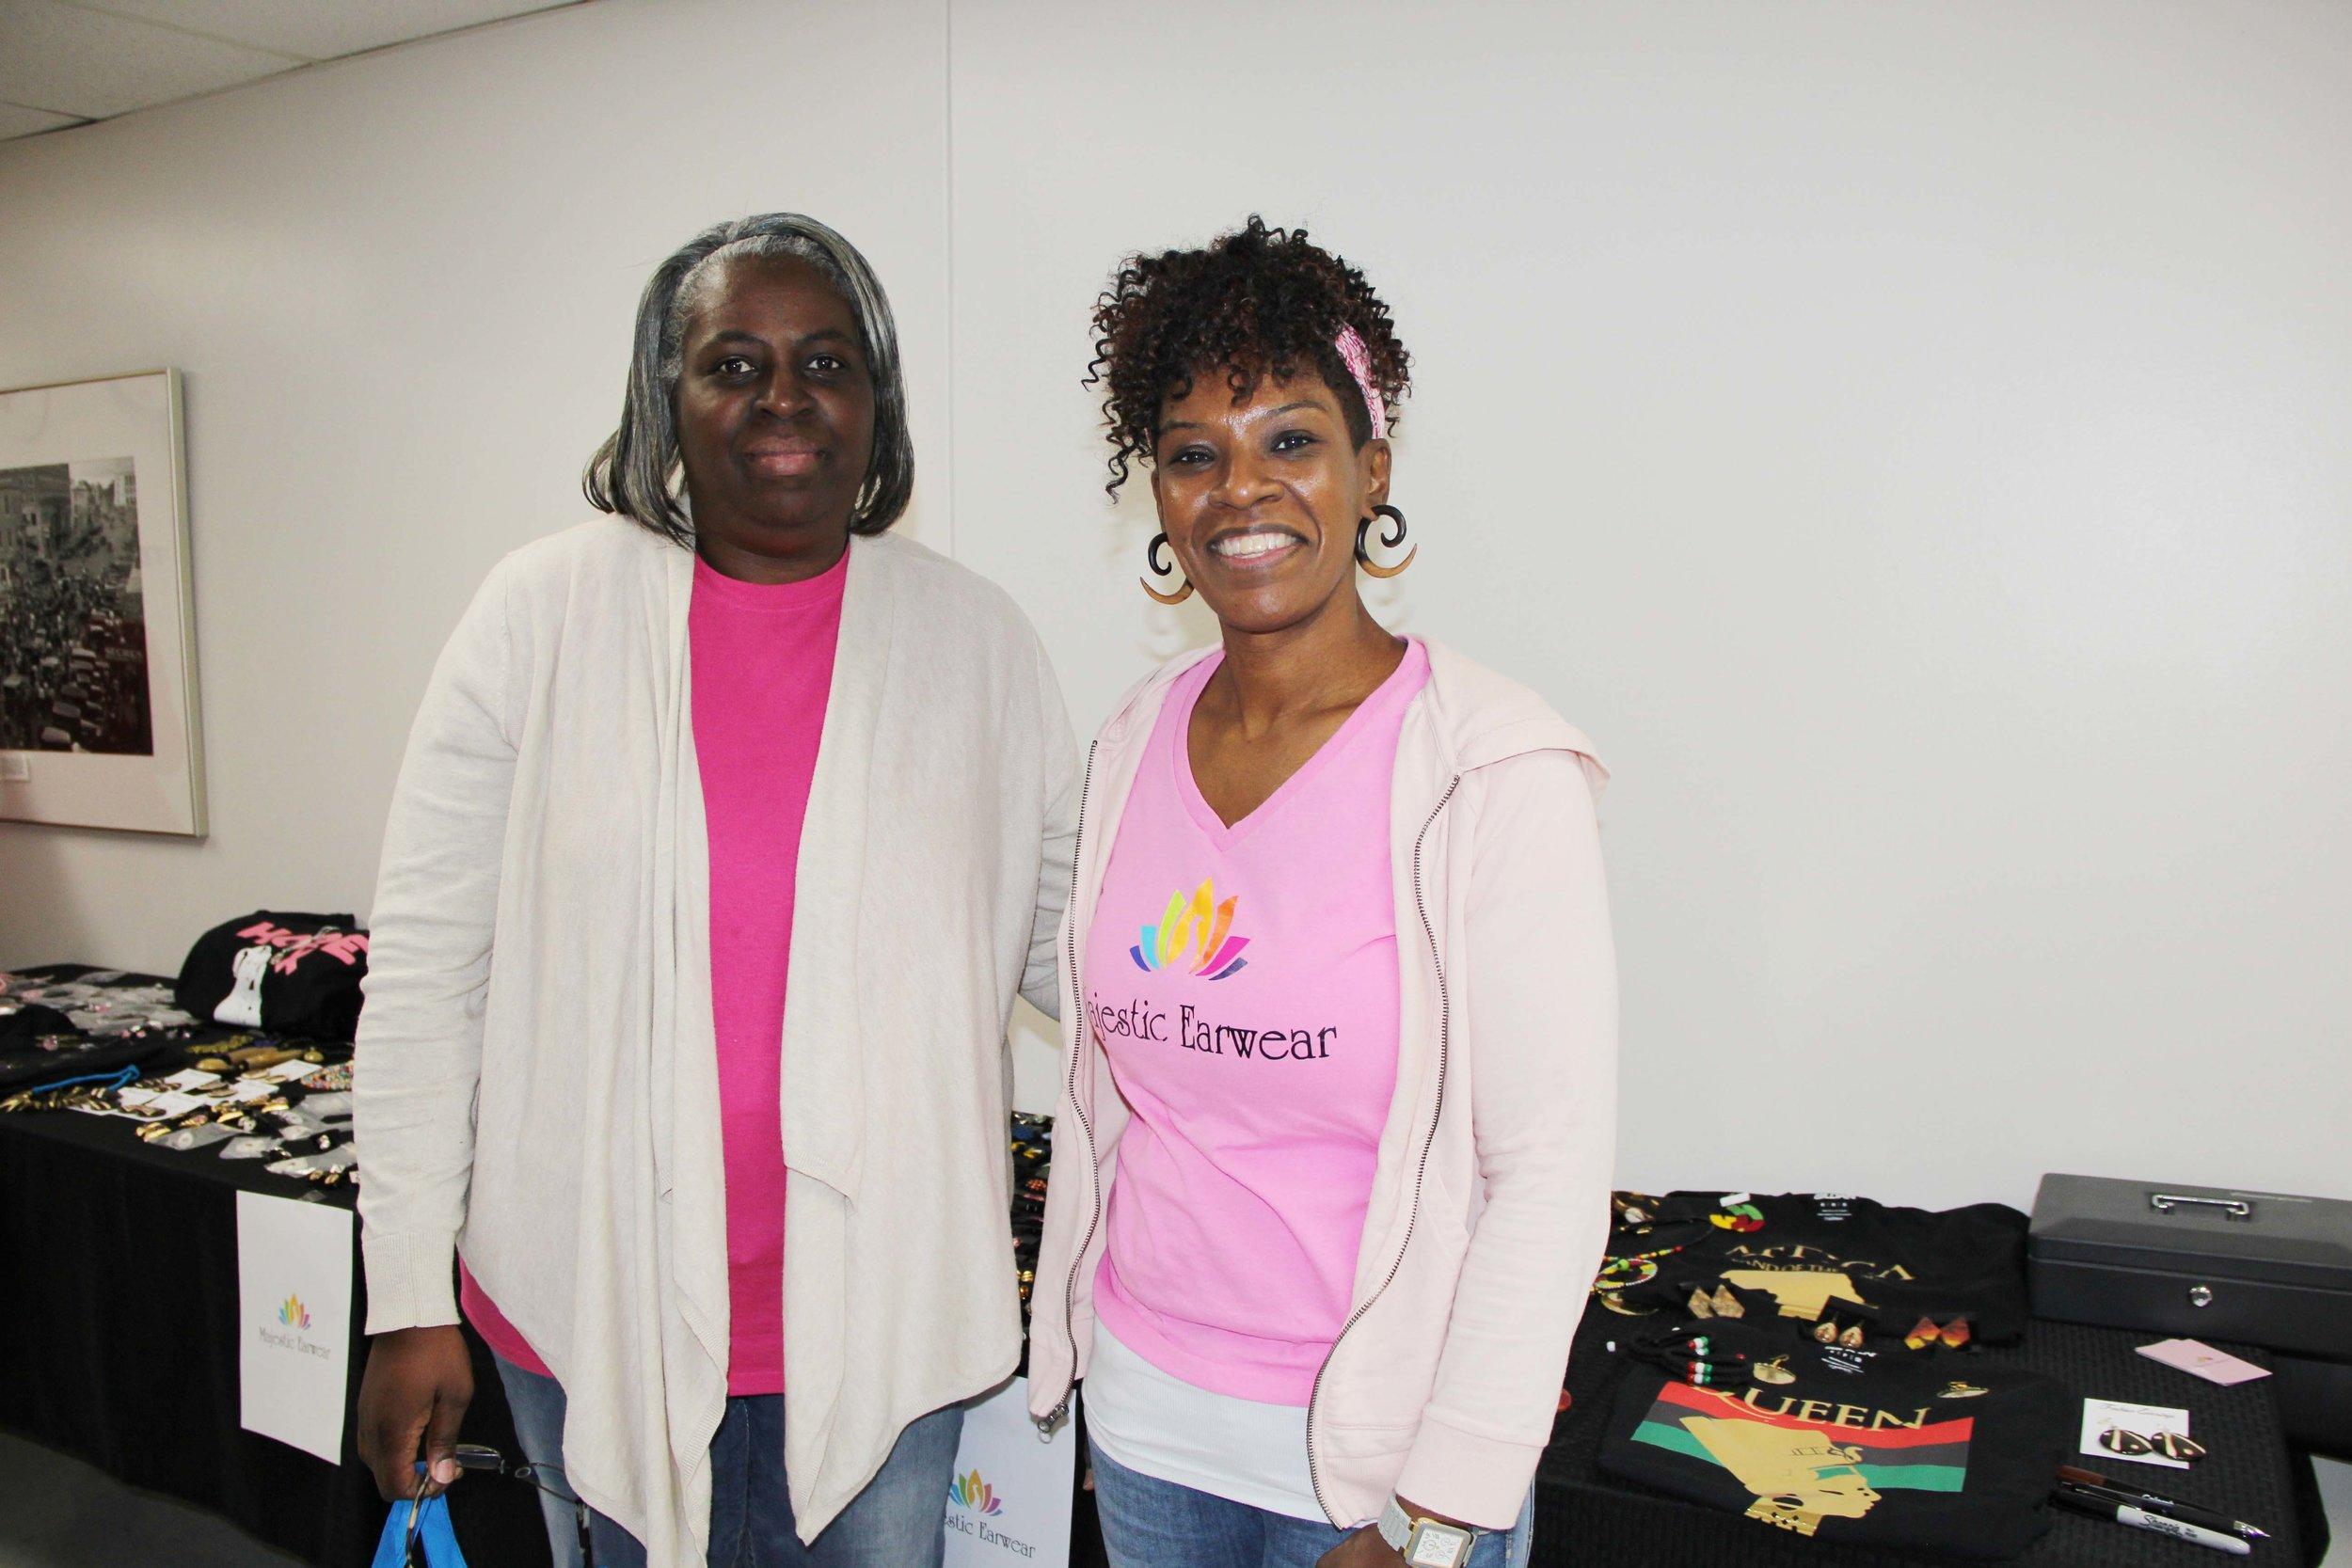 Ann Wilkerson and Marla Jones